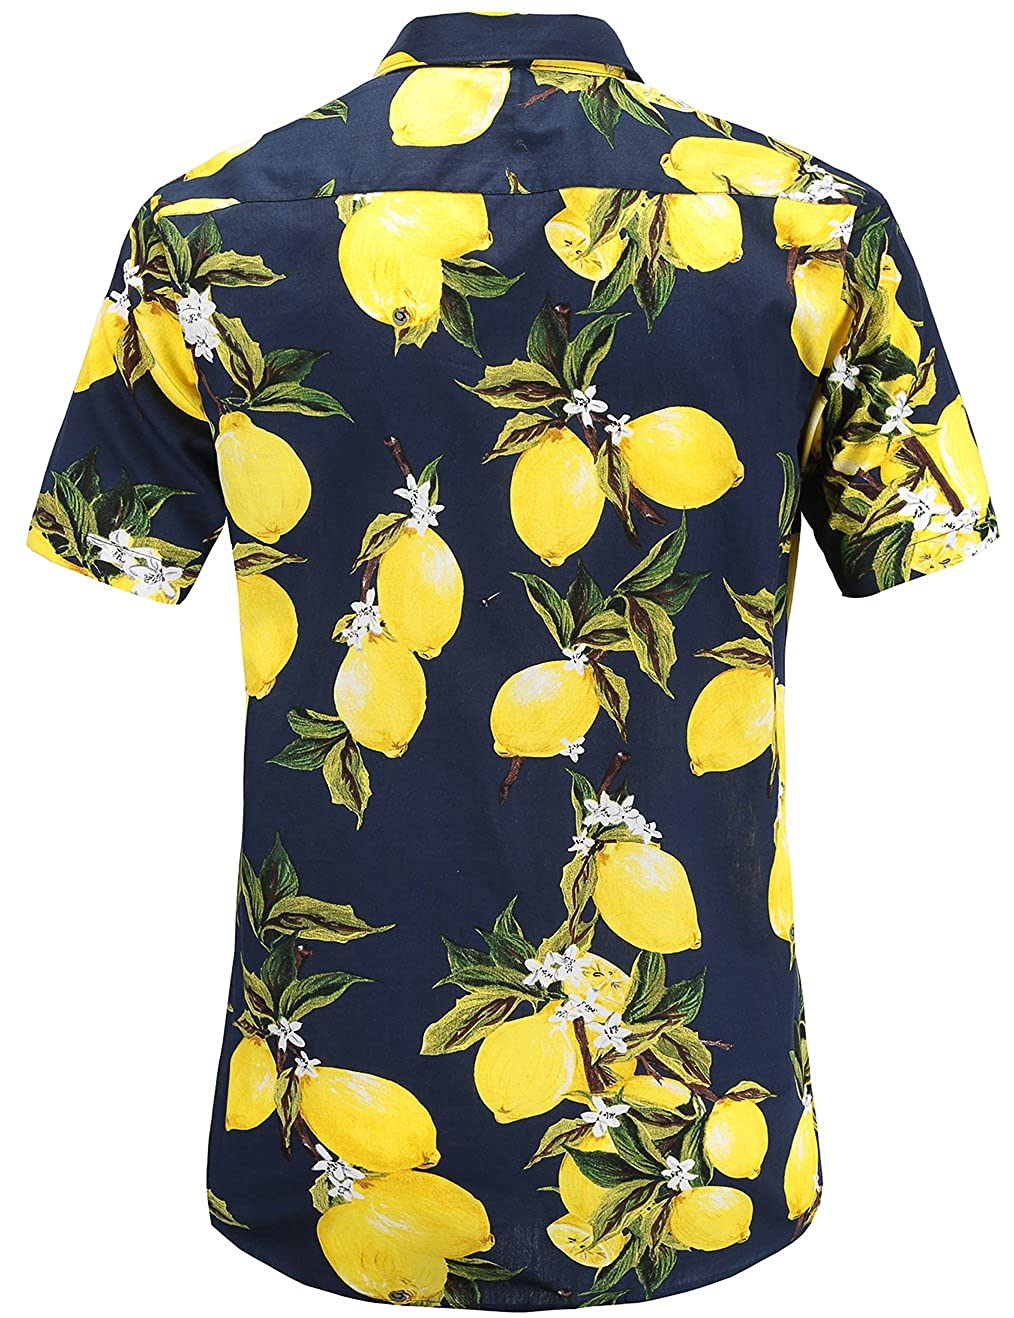 Homme Hawaienne Casual Ananas Manches Été Chemise Courtes Jeetoo shxtQdCr